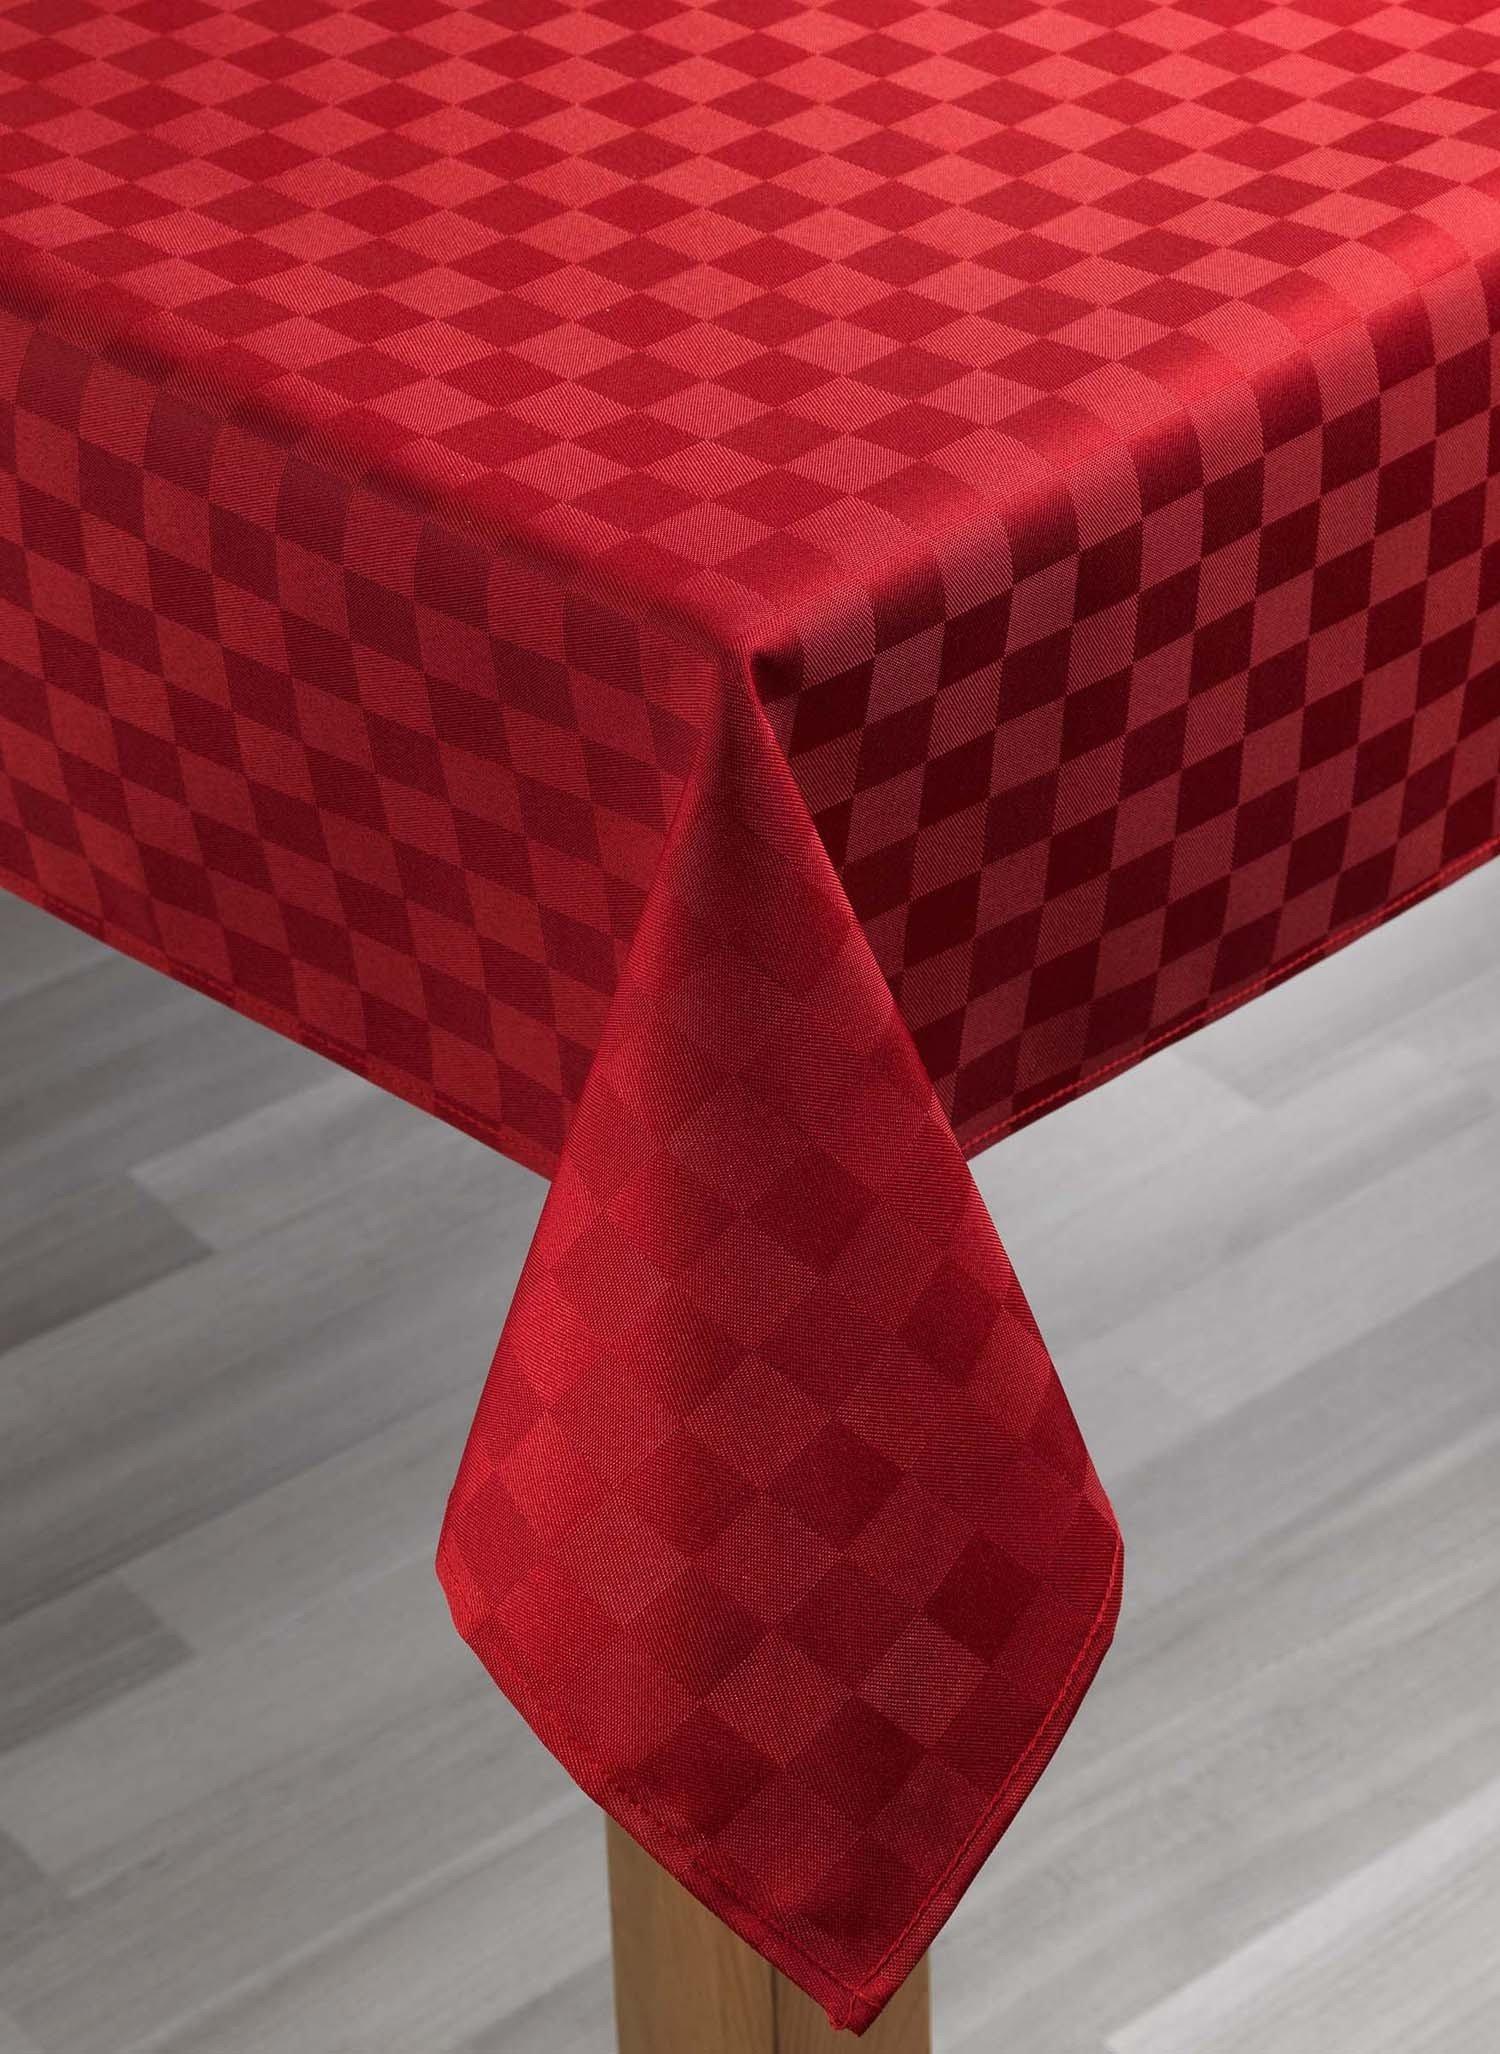 S-Tischd.J-Würfel bord.140x180 - 2 - Ronja.ch